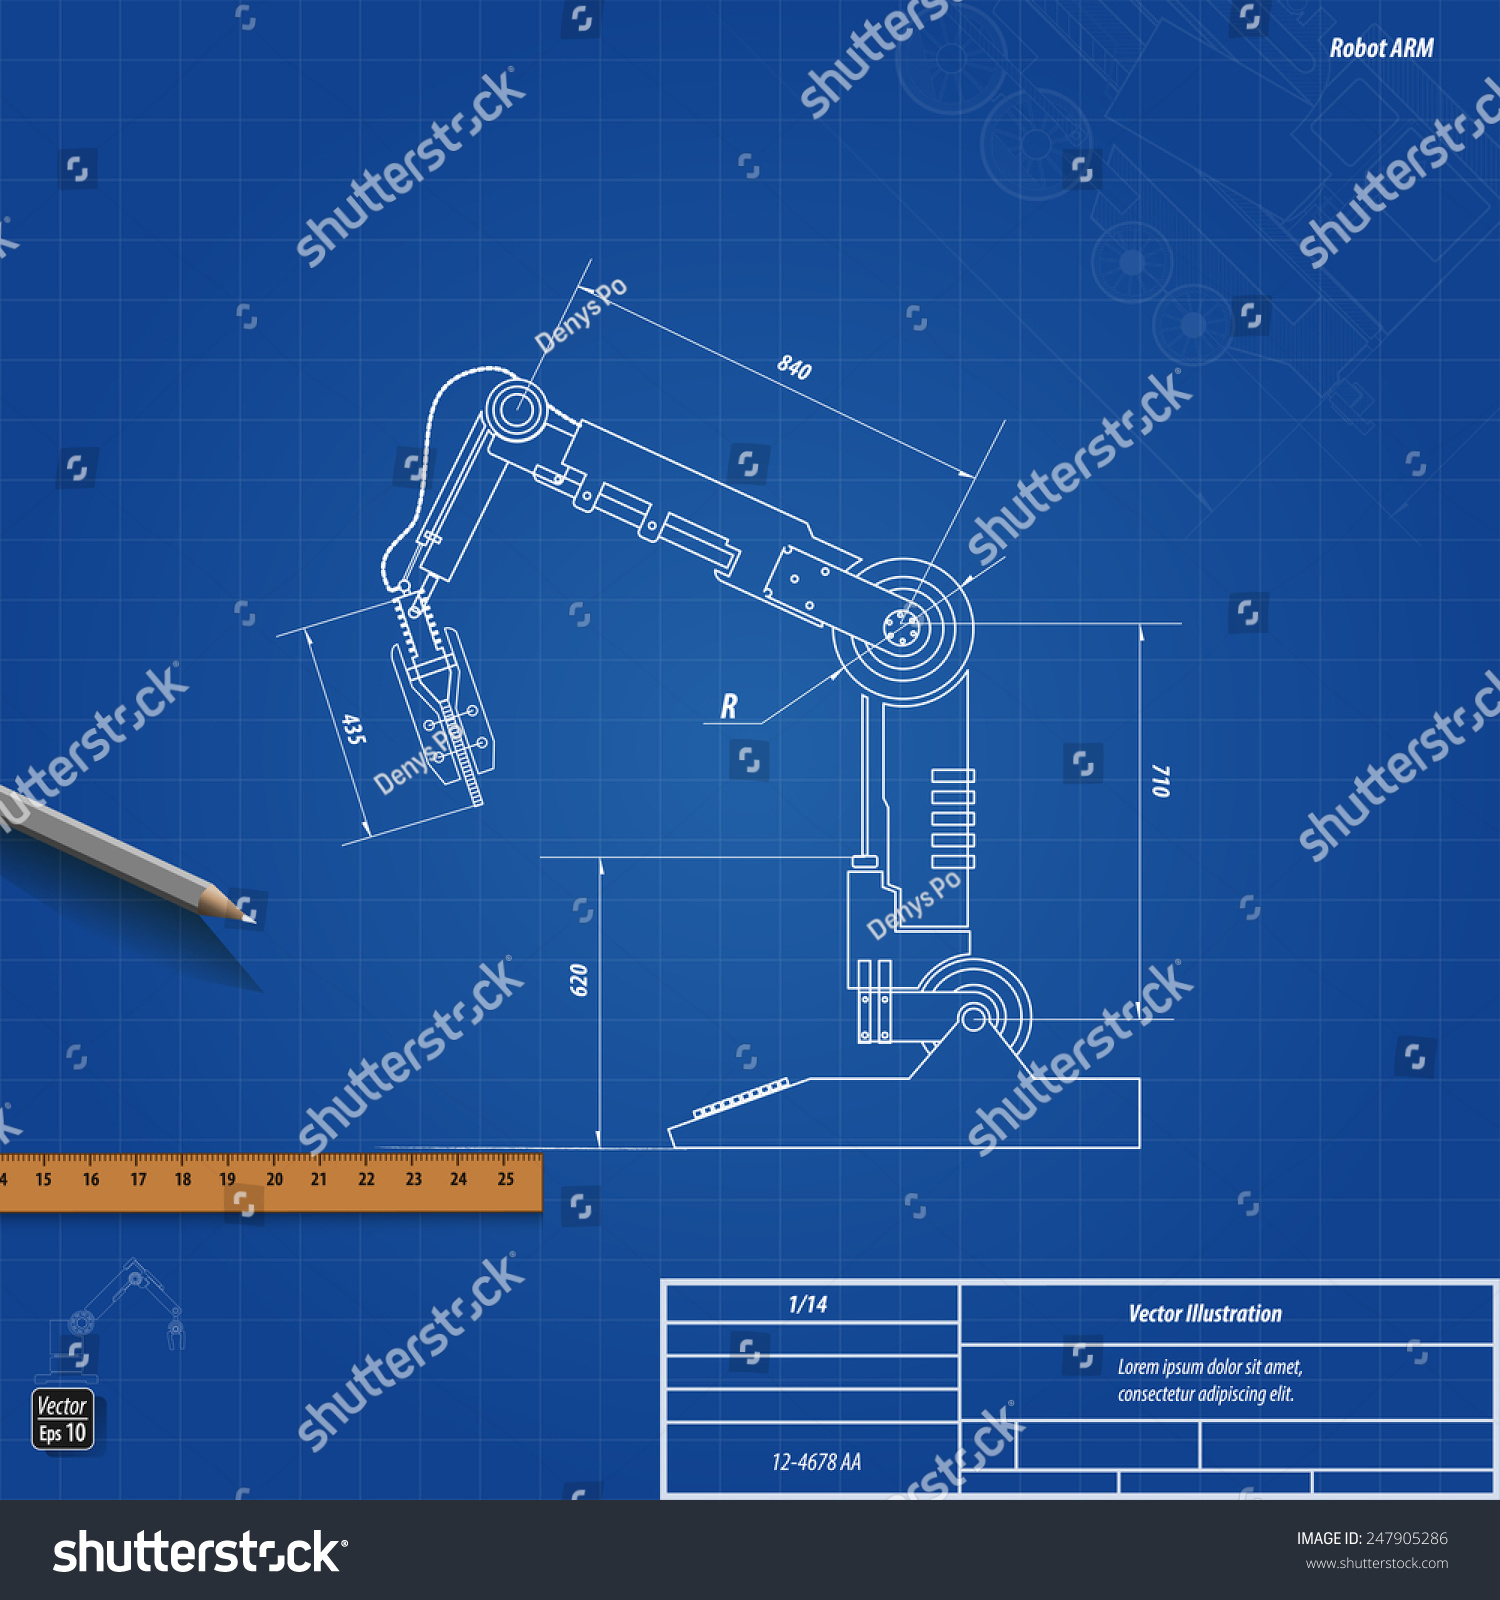 Beautiful how to draw blueprints architecture nice blueprint robotic arm vector illustration eps stock vector malvernweather Choice Image